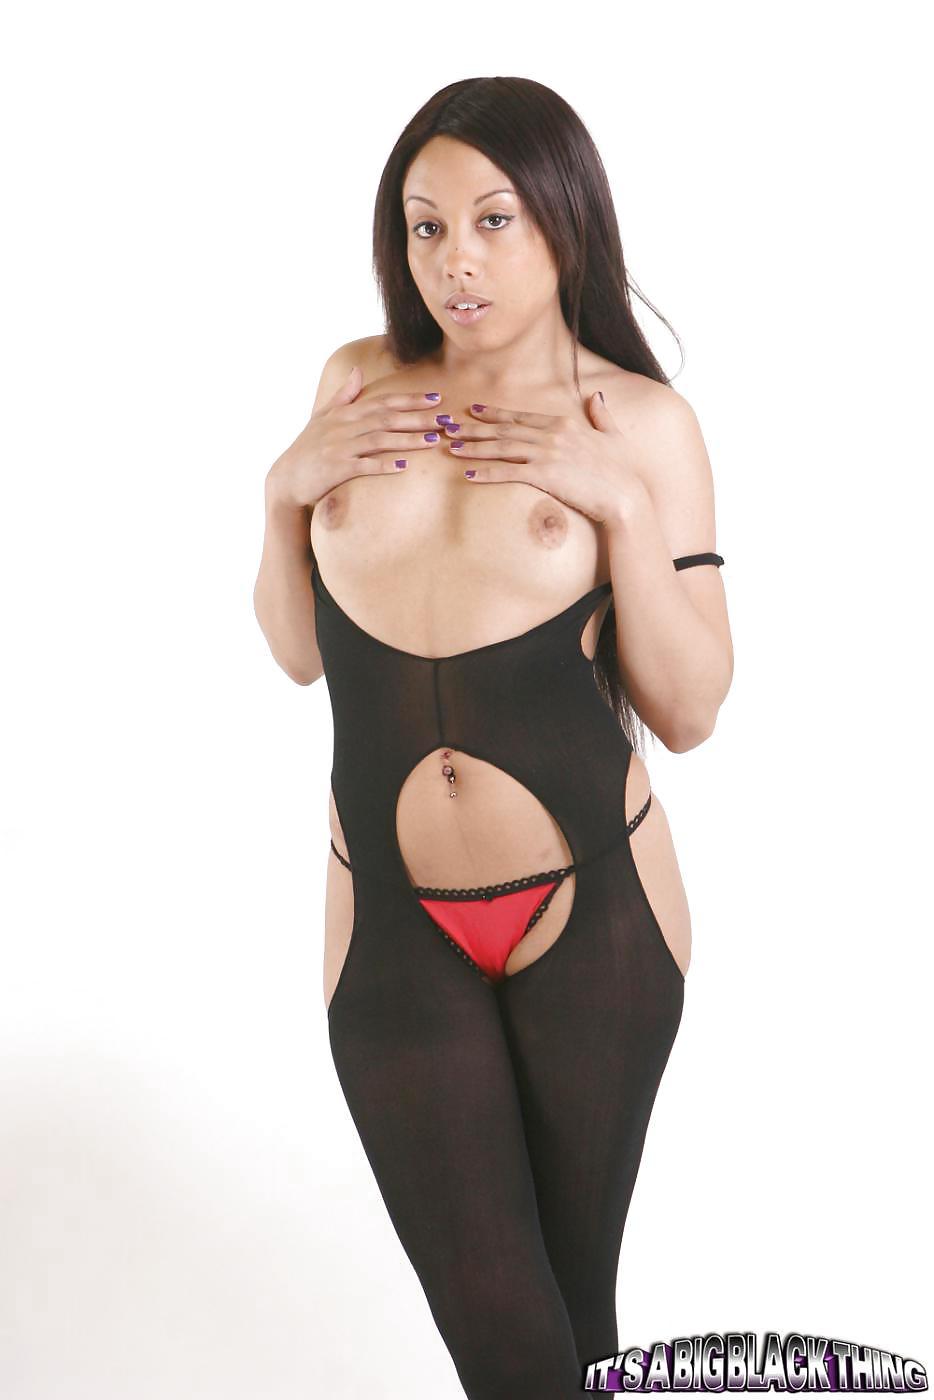 Porn star vanessa delrio